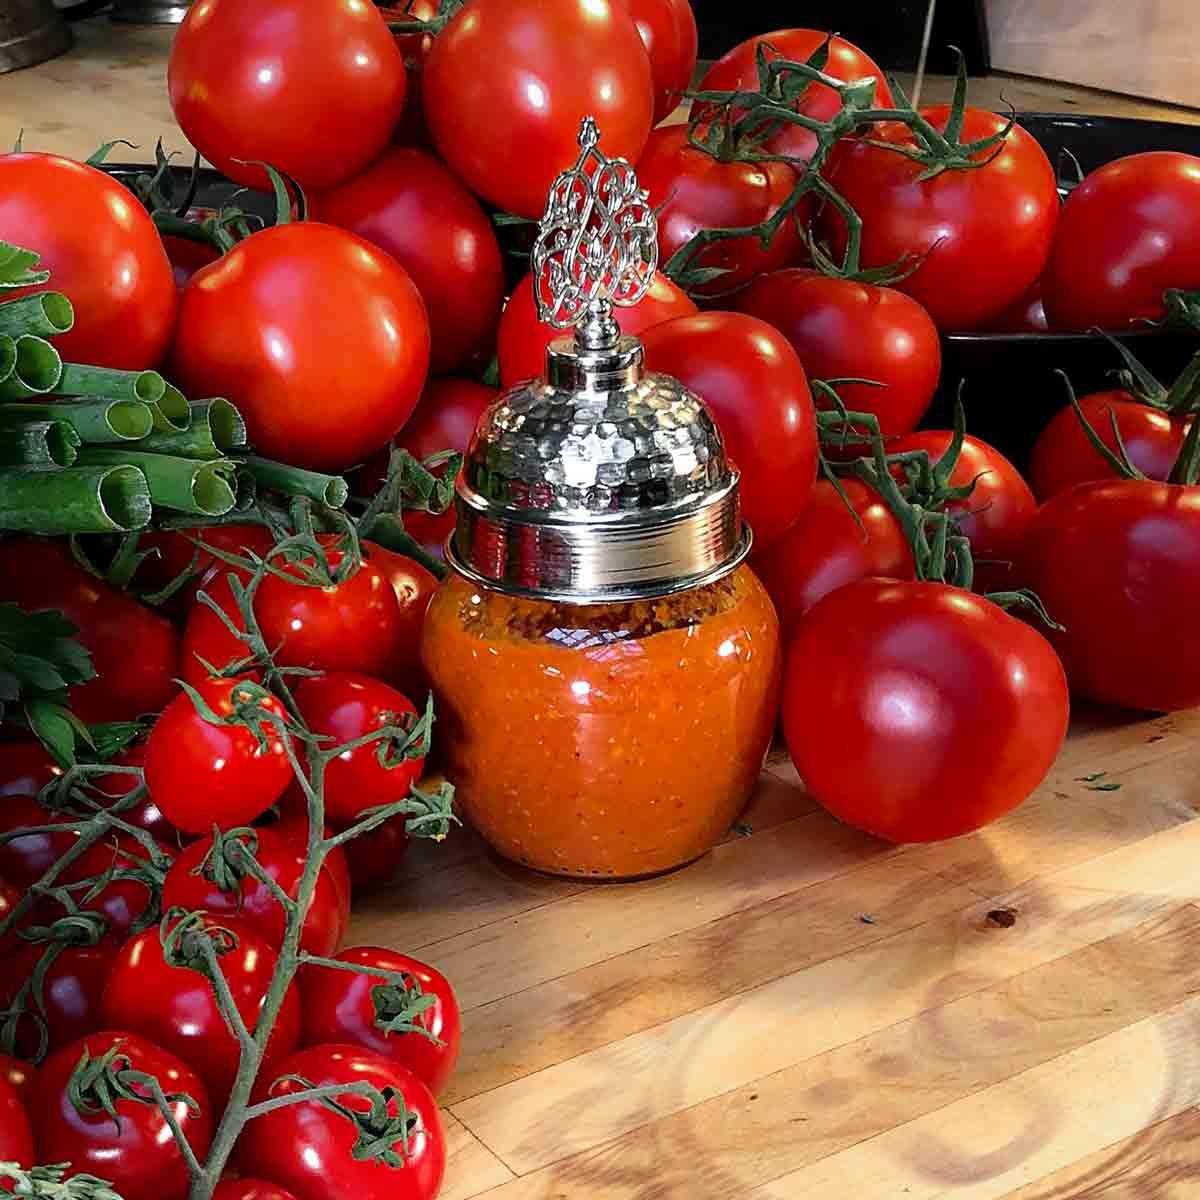 *Közlenmiş domates mezesi* ~ Aufstrich mit gerösteten Tomaten